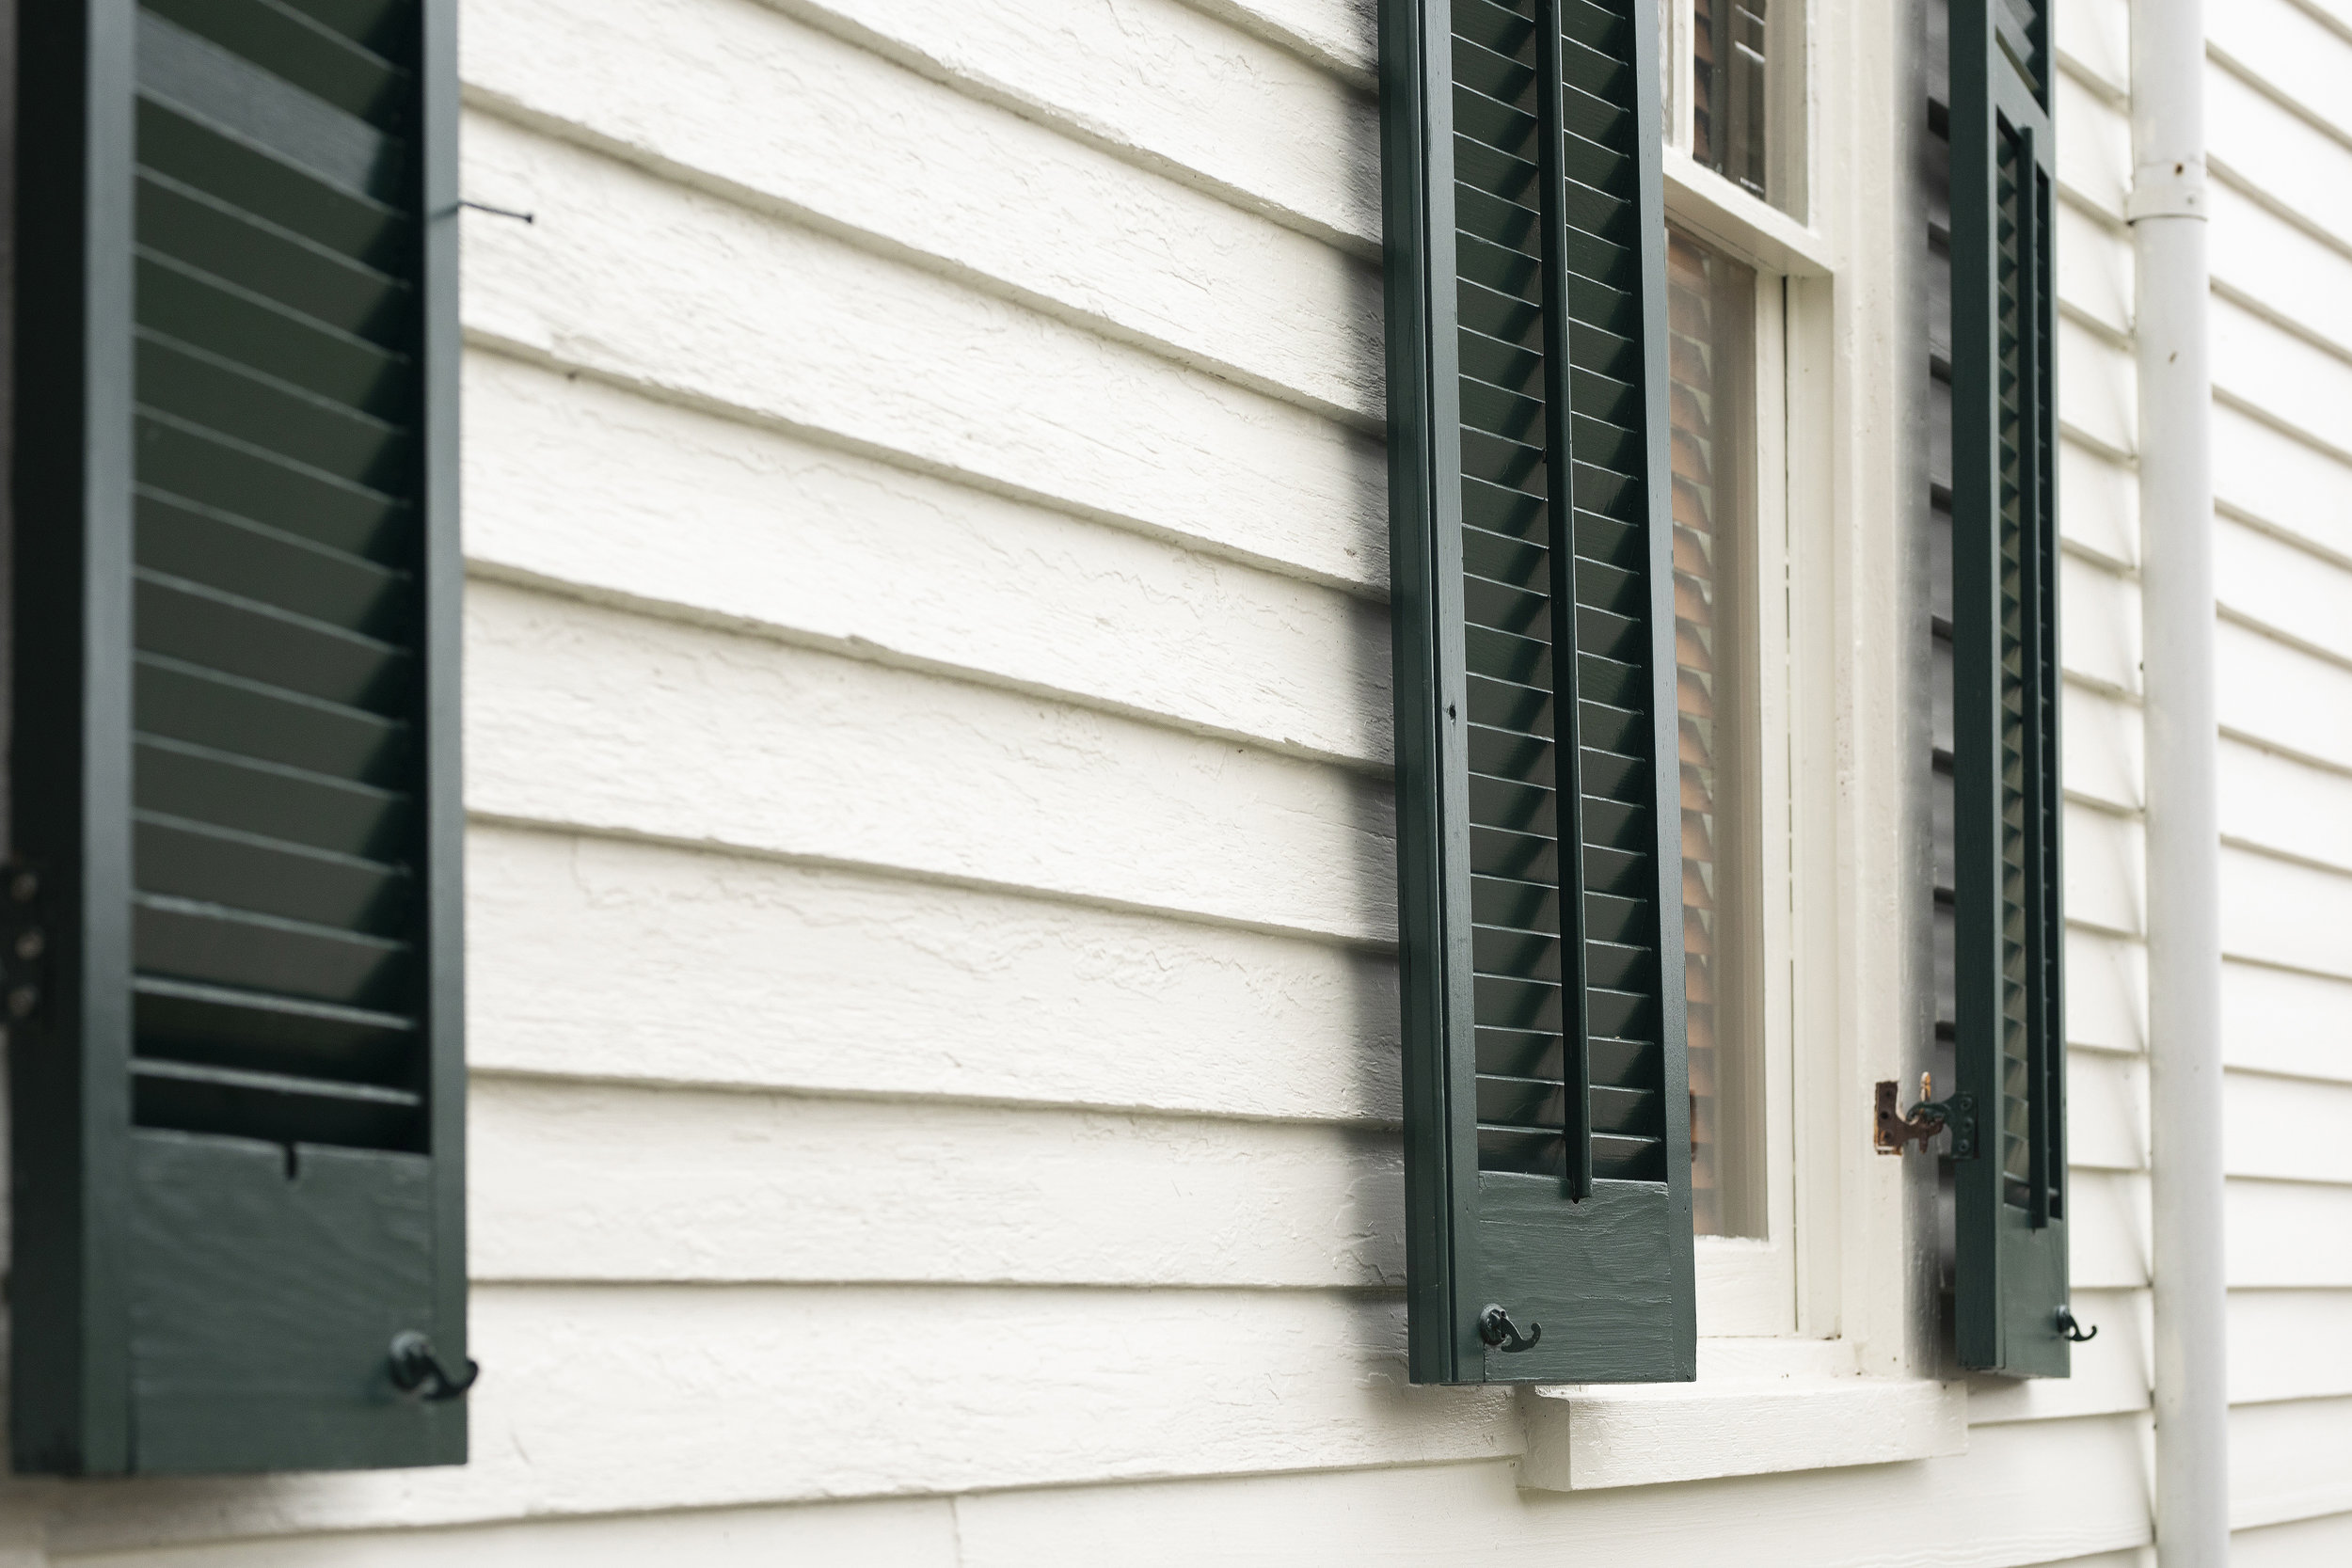 breedavis|airbnb|portfolio|23.jpg